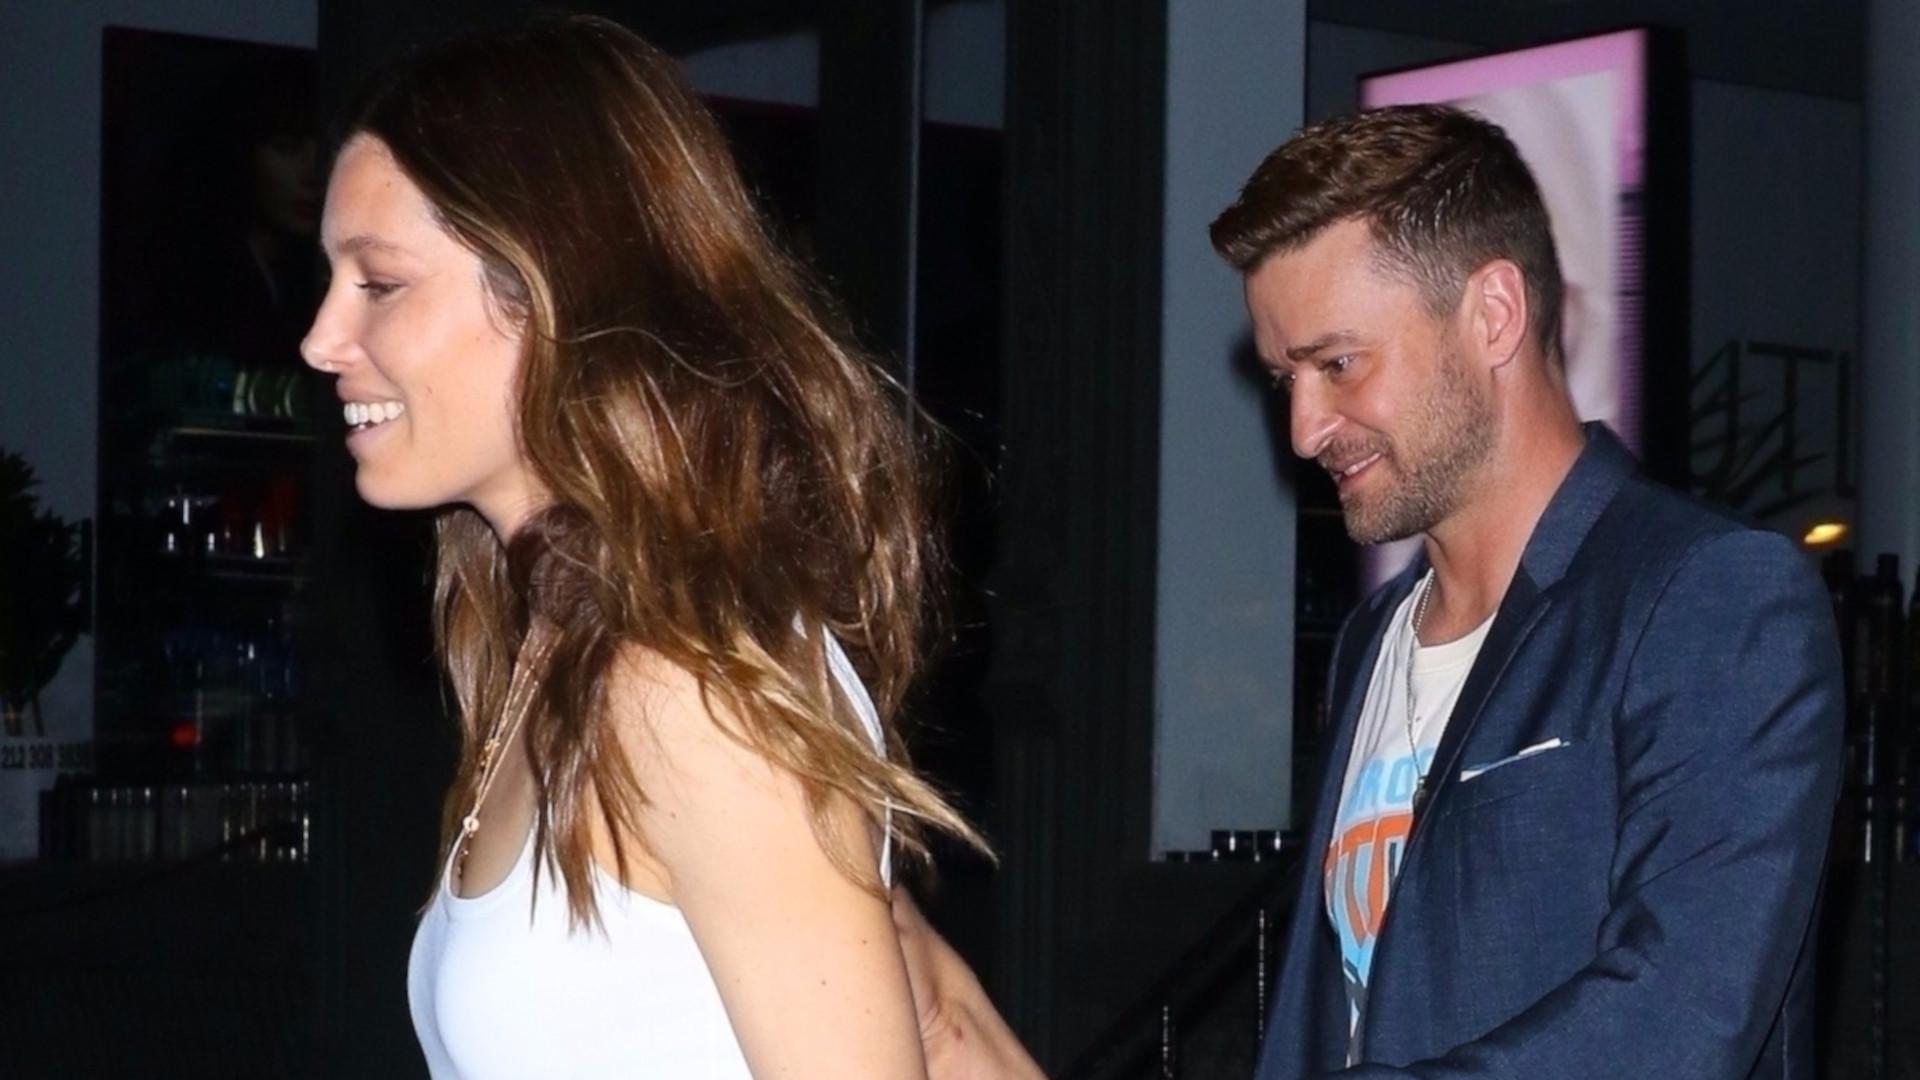 Ale ZAKOCHANI! Justin Timberlake i Jessica Biel na randce (ZDJĘCIA)